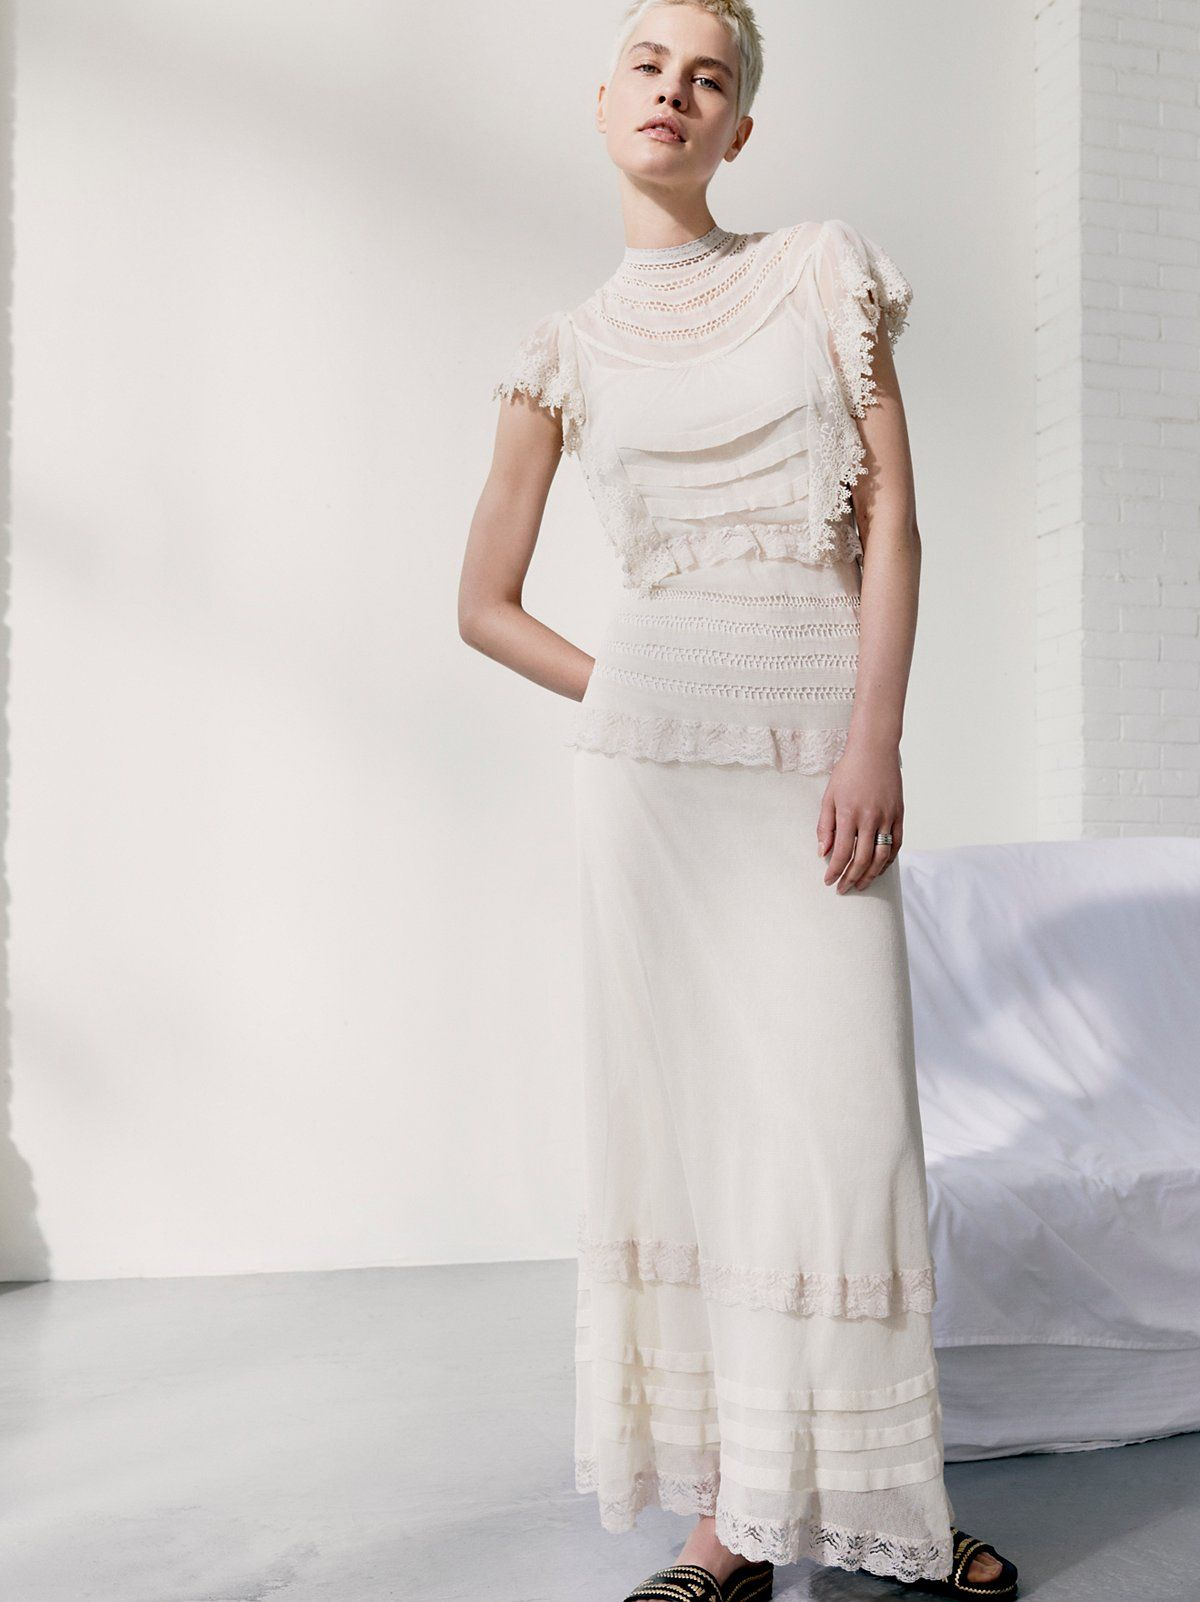 Tabby dress ultra femme sheer mesh maxi dress inspired by decades